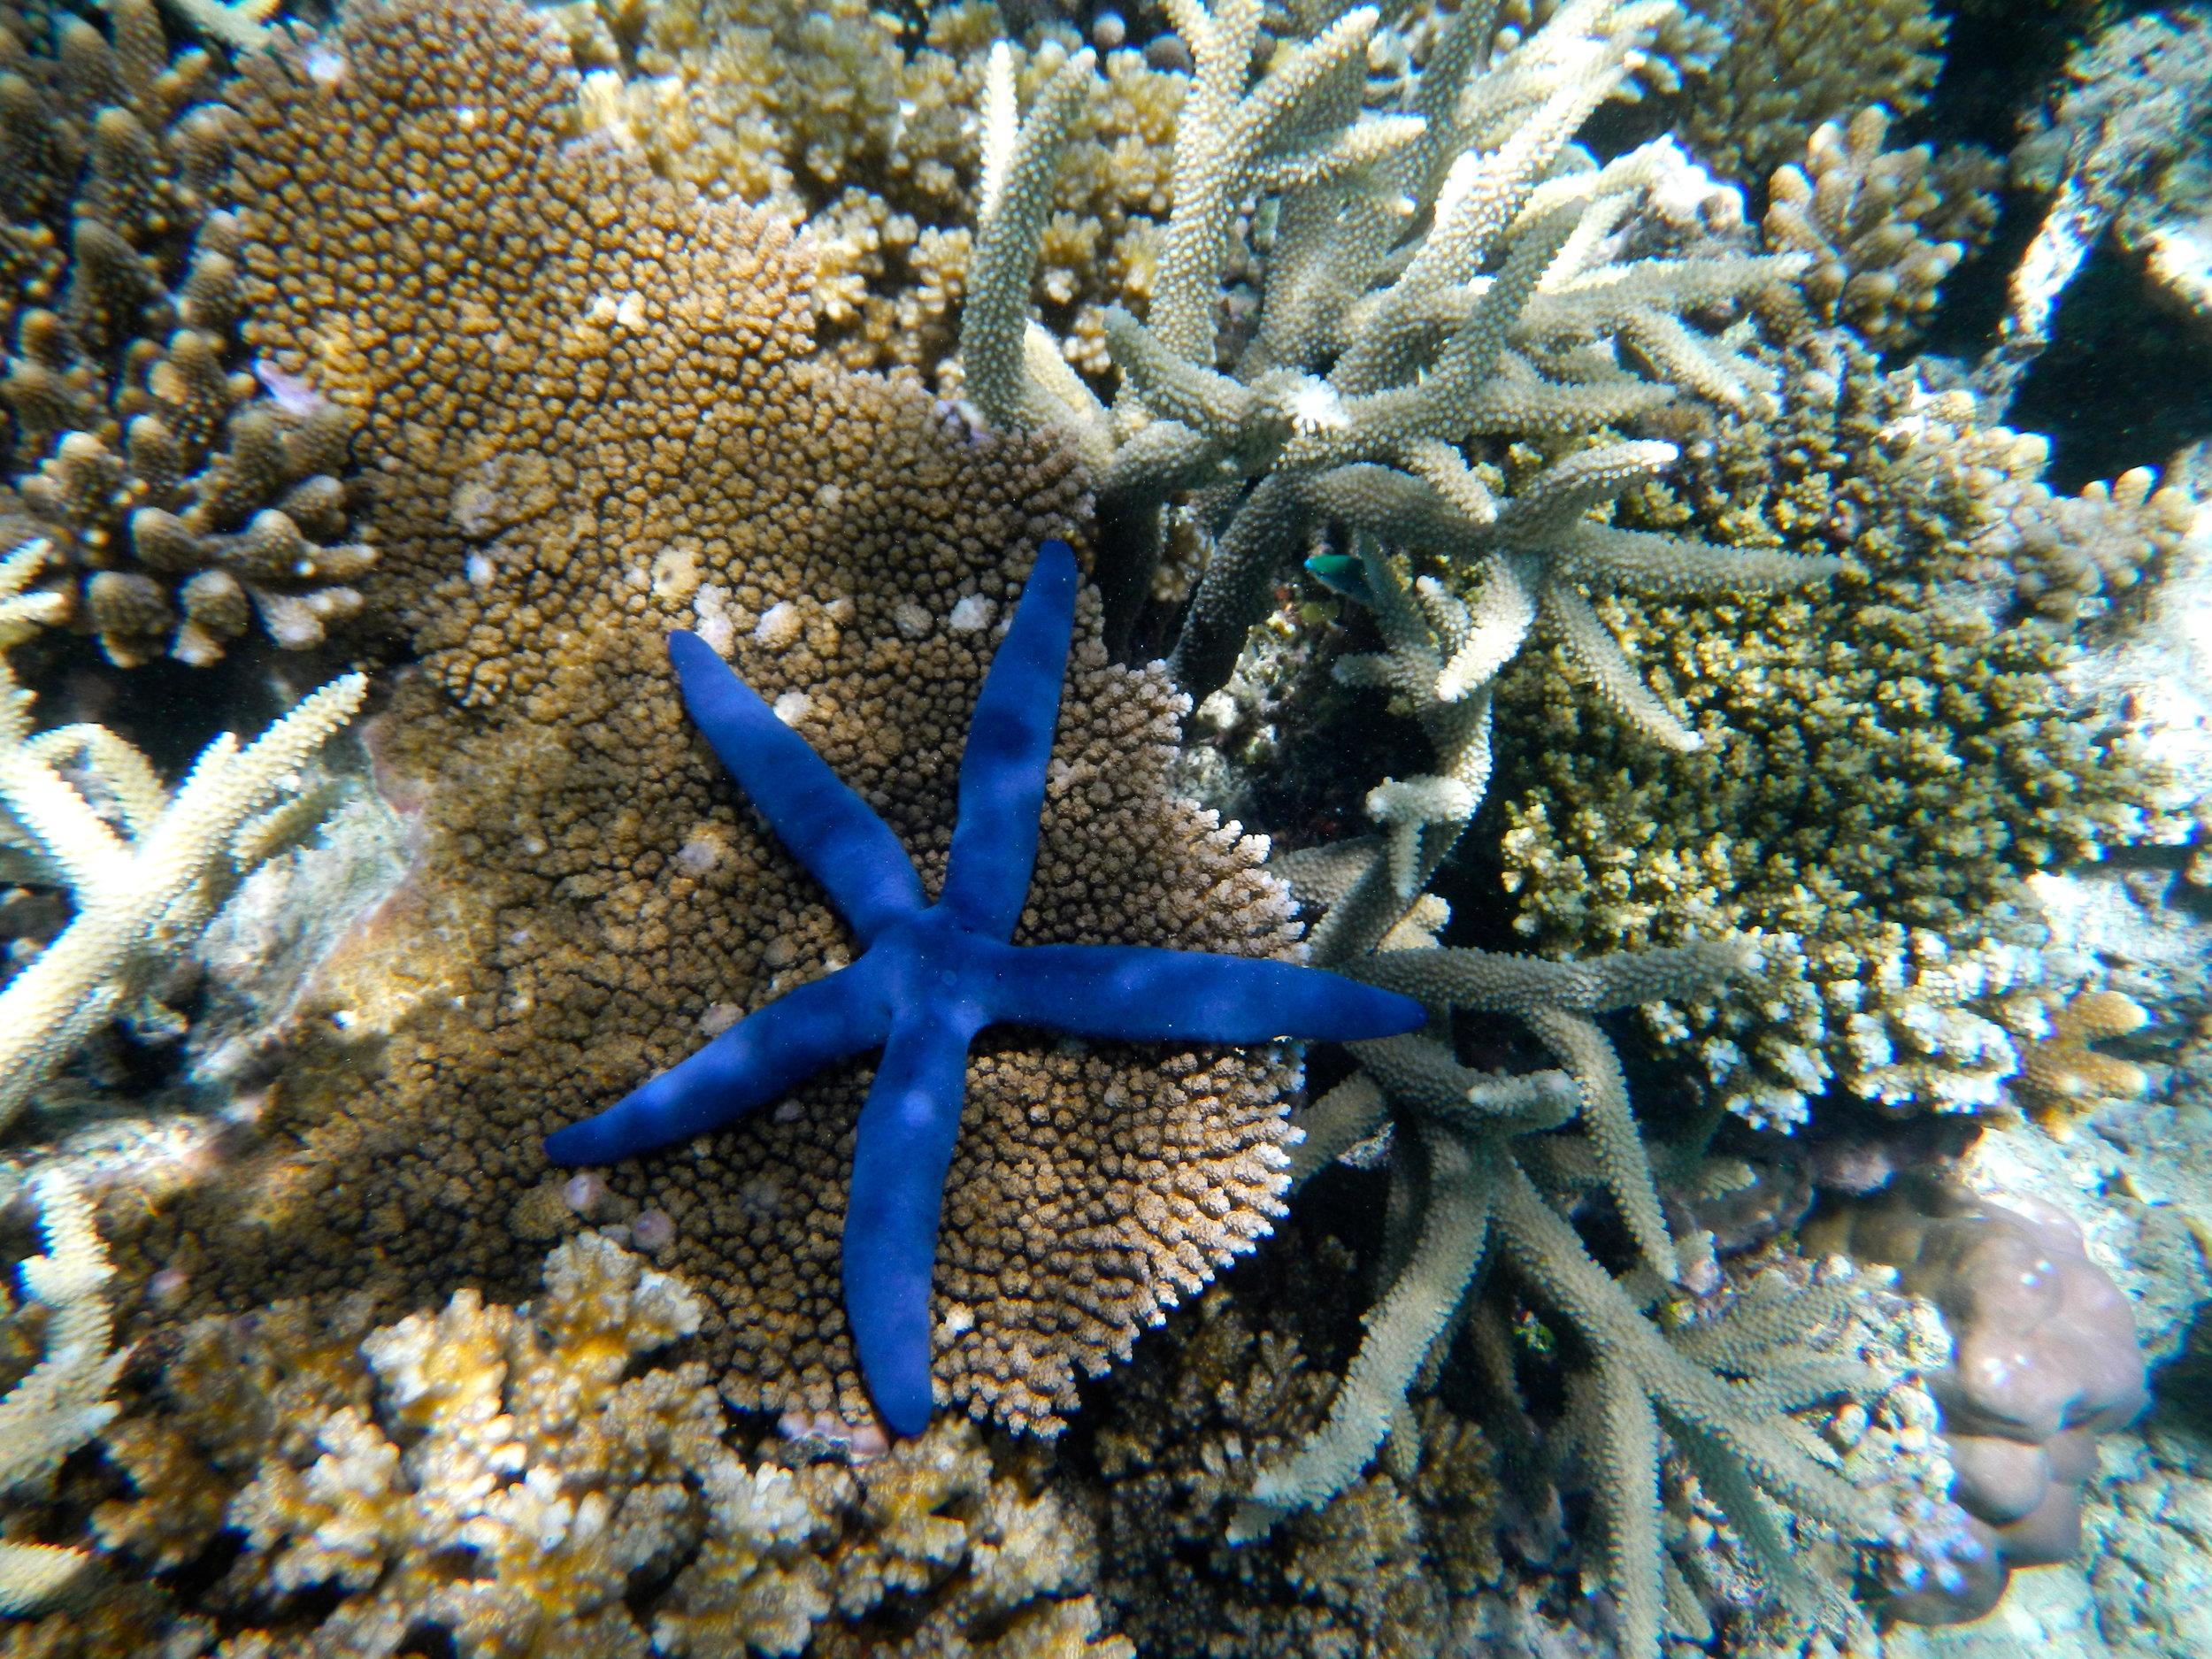 Rainbow Reef Fiji Starfish Snorkel.JPG